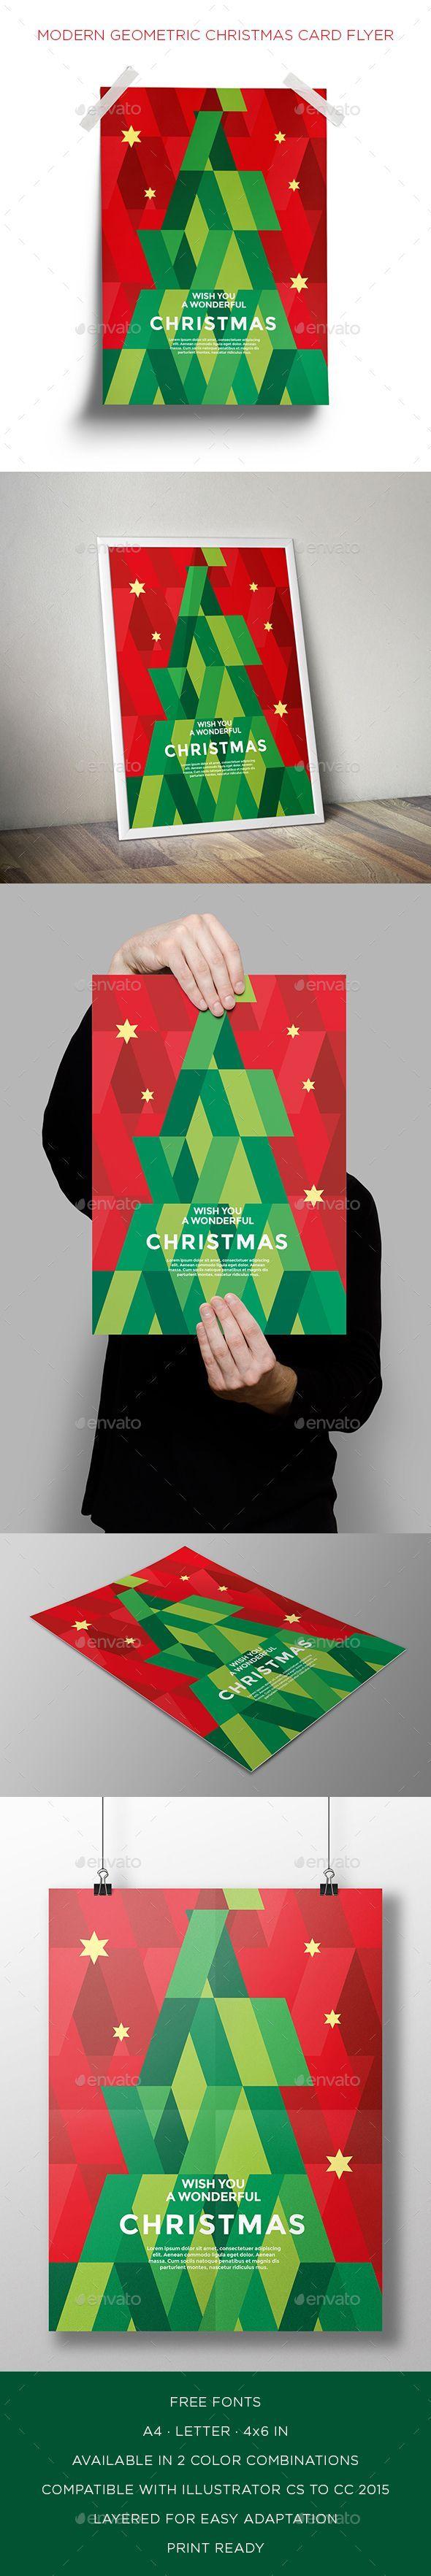 free printable funny0th birthday invitations%0A Modern Geometric Christmas Card Flyer